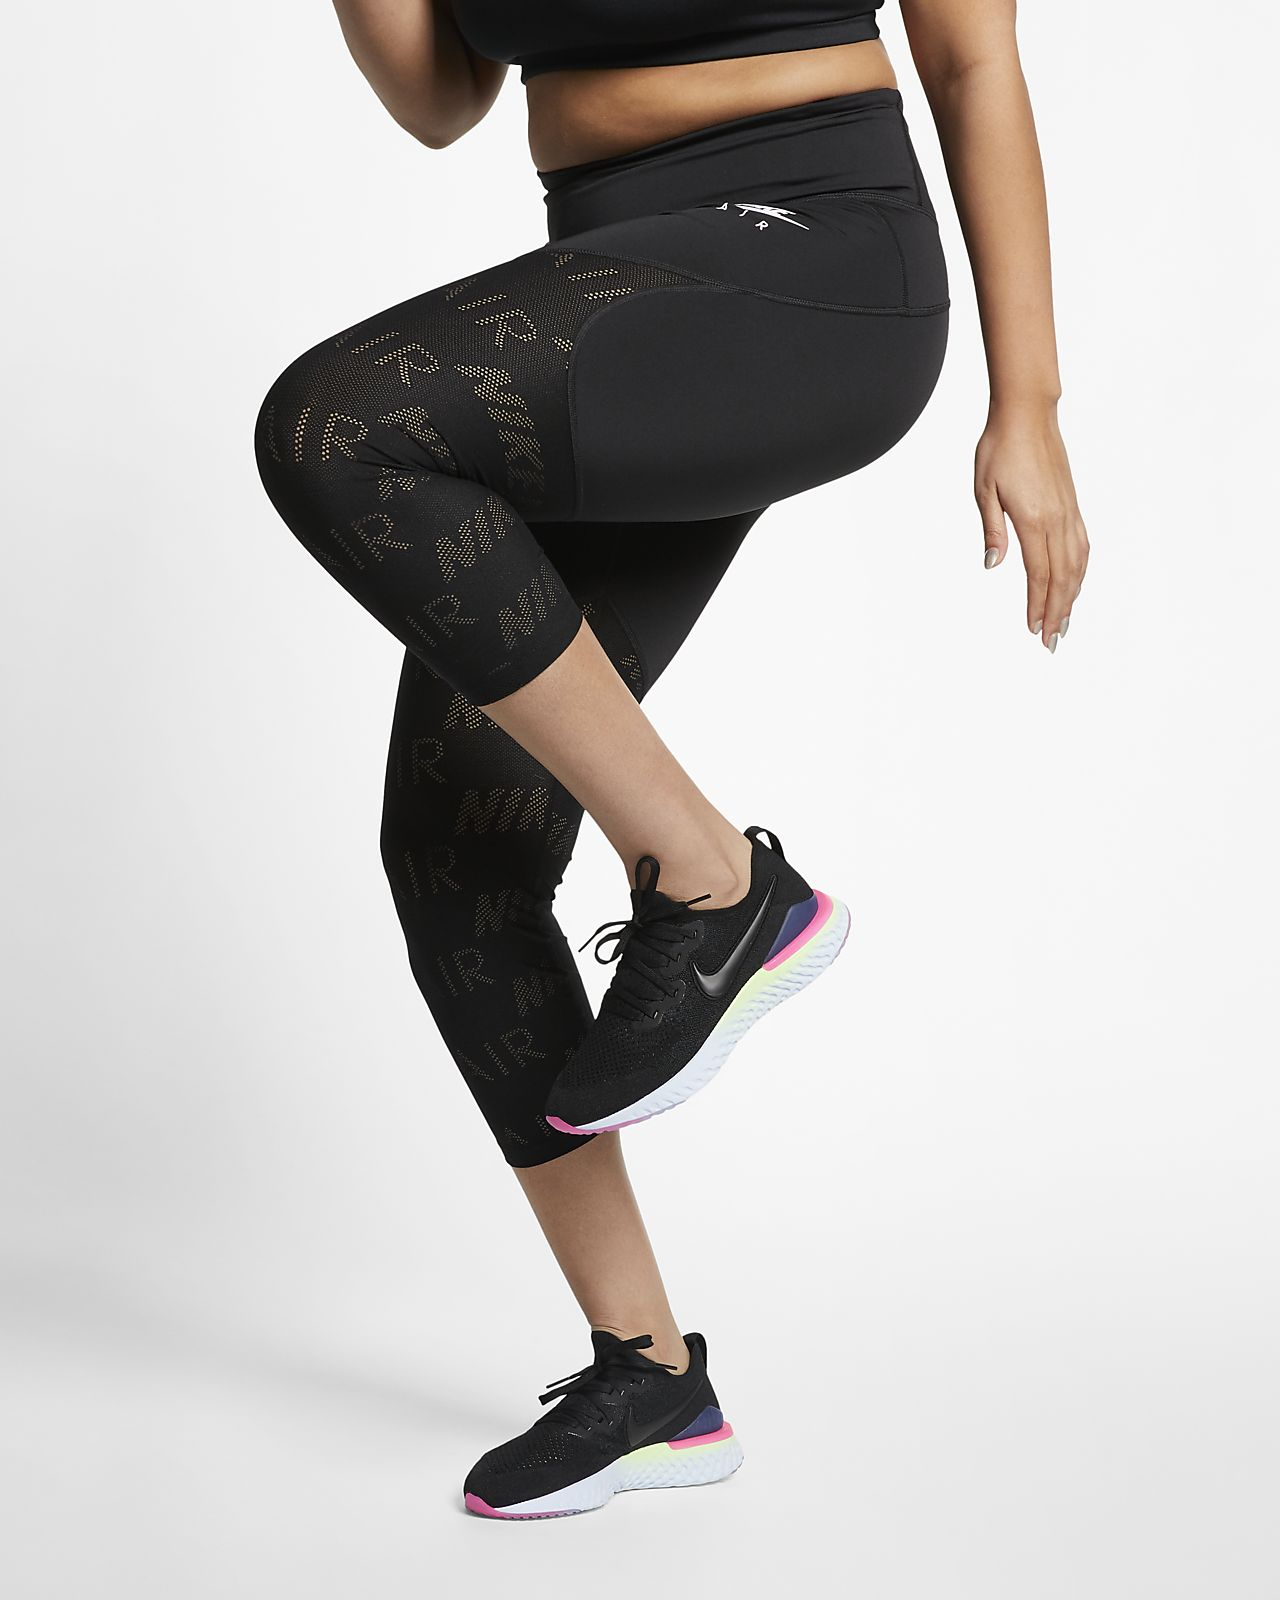 dbc4cbbd9cbf Γυναικείο κολάν 3 4 για τρέξιμο Nike Air Fast (μεγάλα μεγέθη). Nike ...